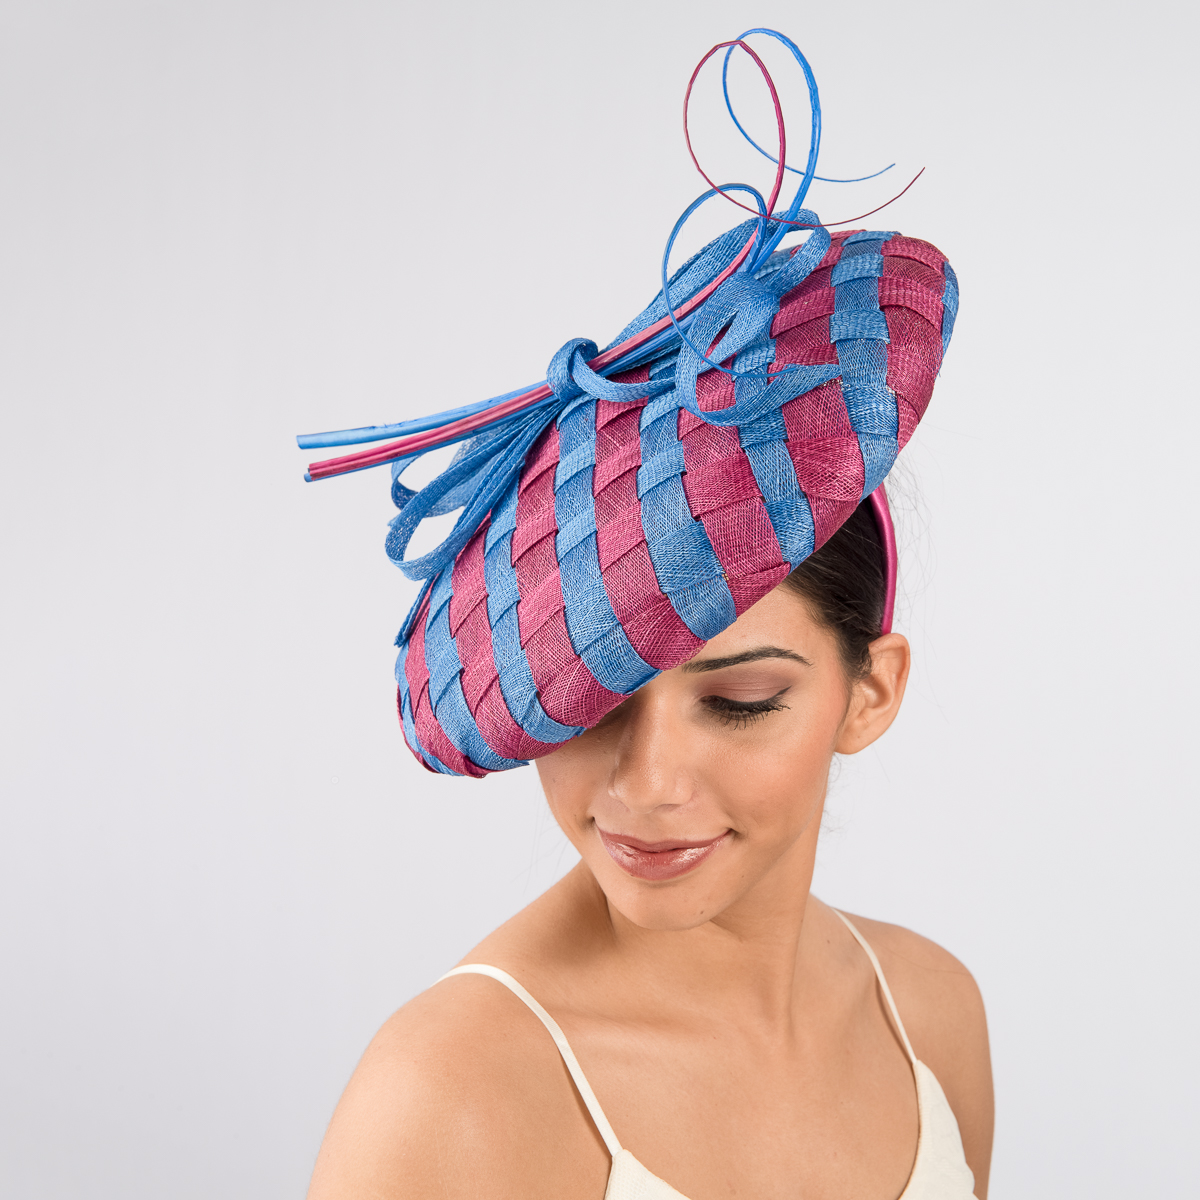 Royal - Geisha Beret Self Bow Headband Fascinator Cocktail  Hats-102029-RY.GS- Sun Yorkos  90d3484a2b9